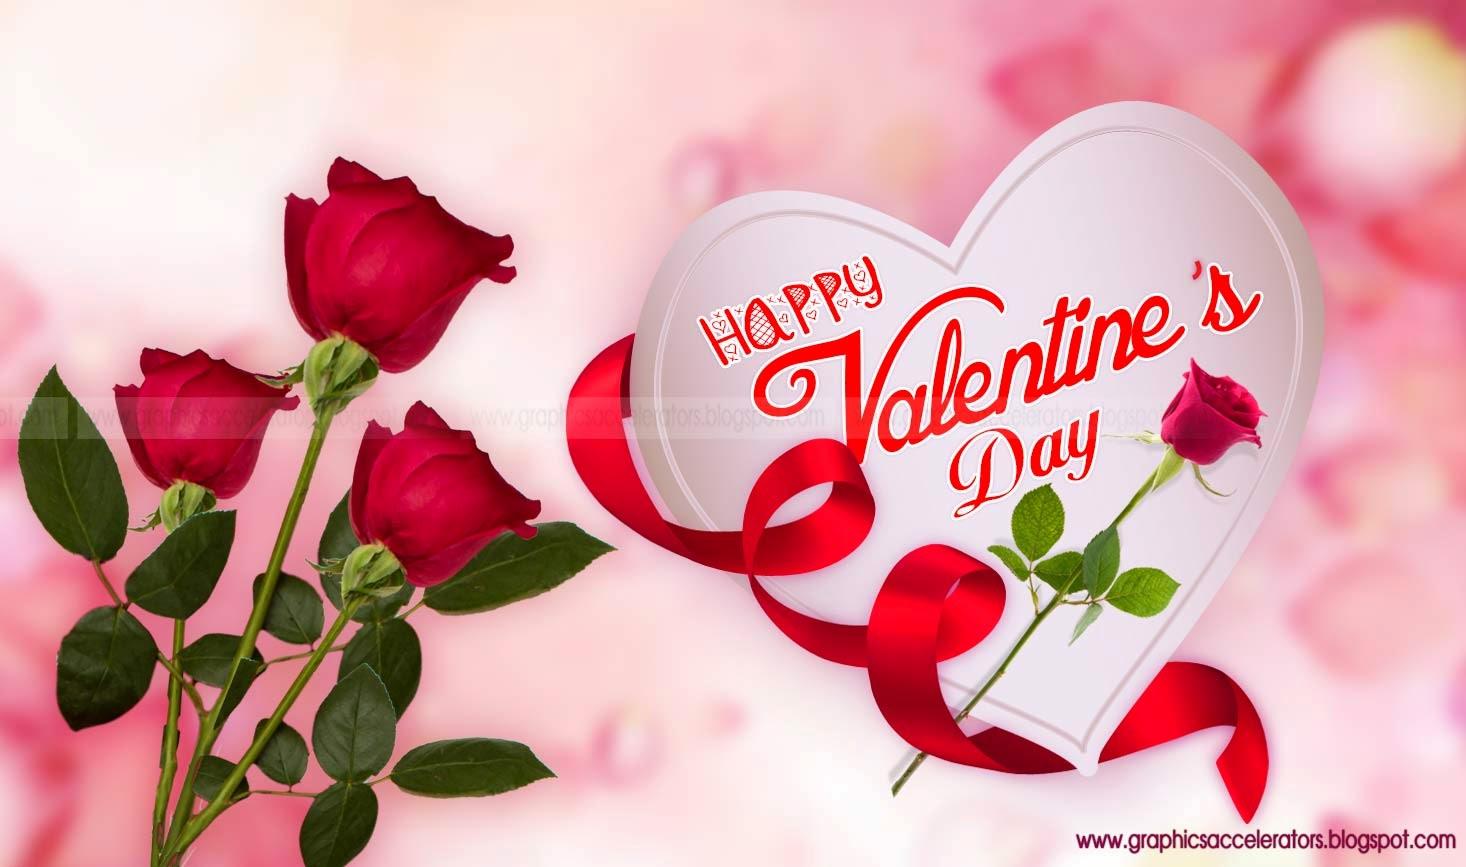 Kumpulan Animasi DP BBM Gambar Bergerak Valentine 2014